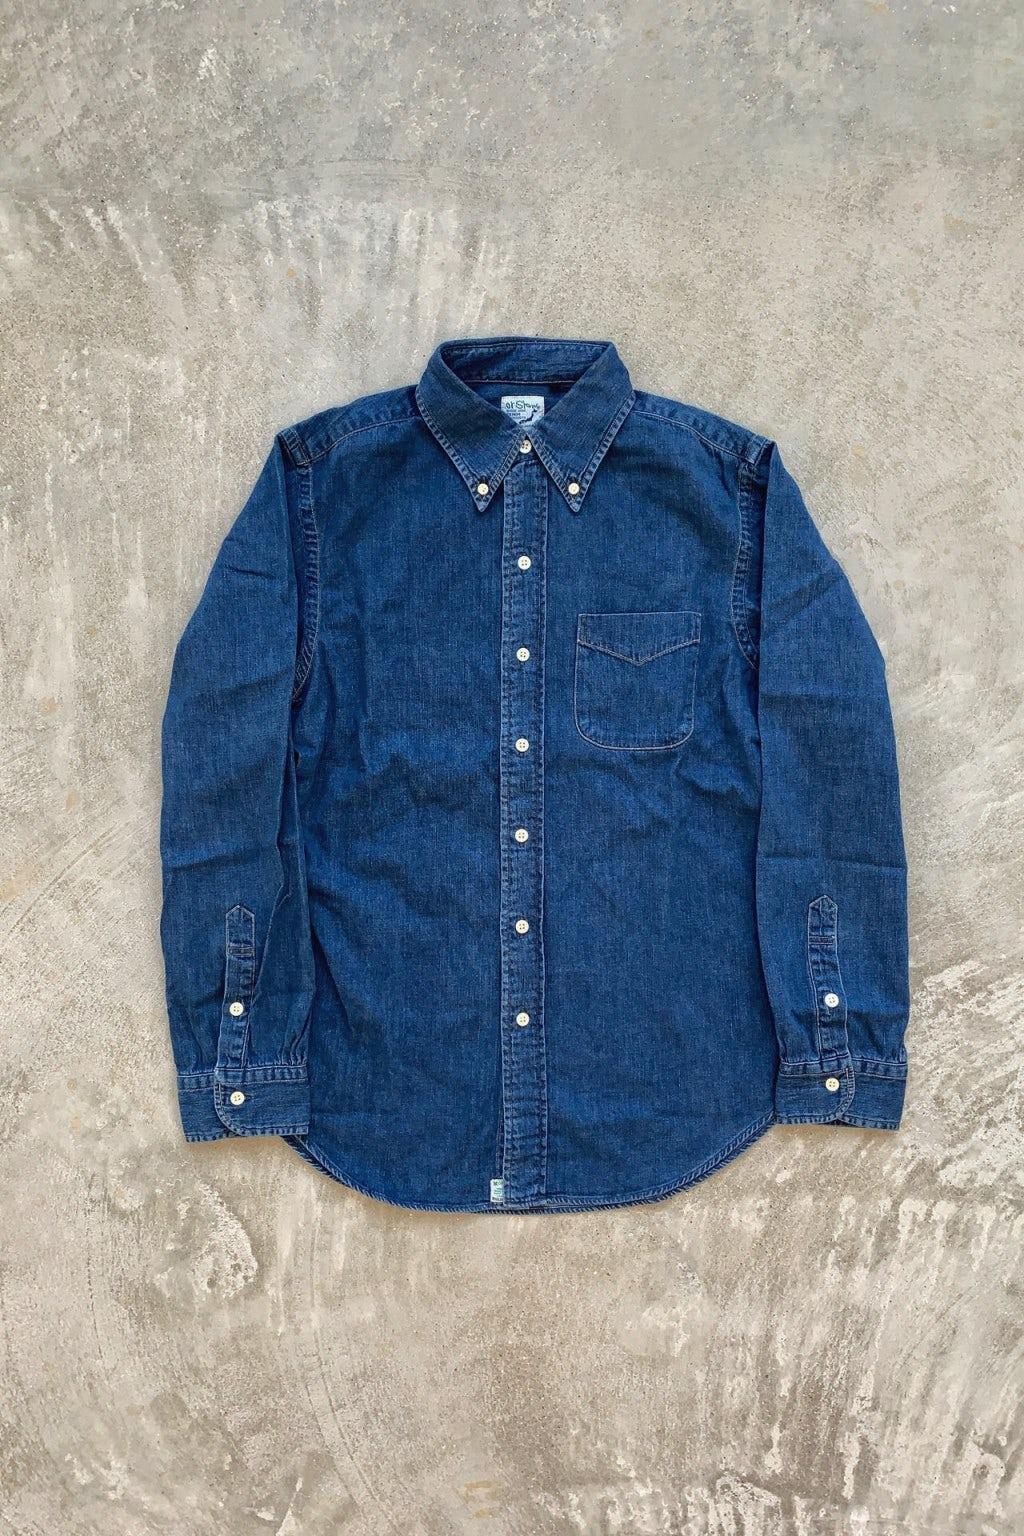 Orslow Used Denim Shirt 95